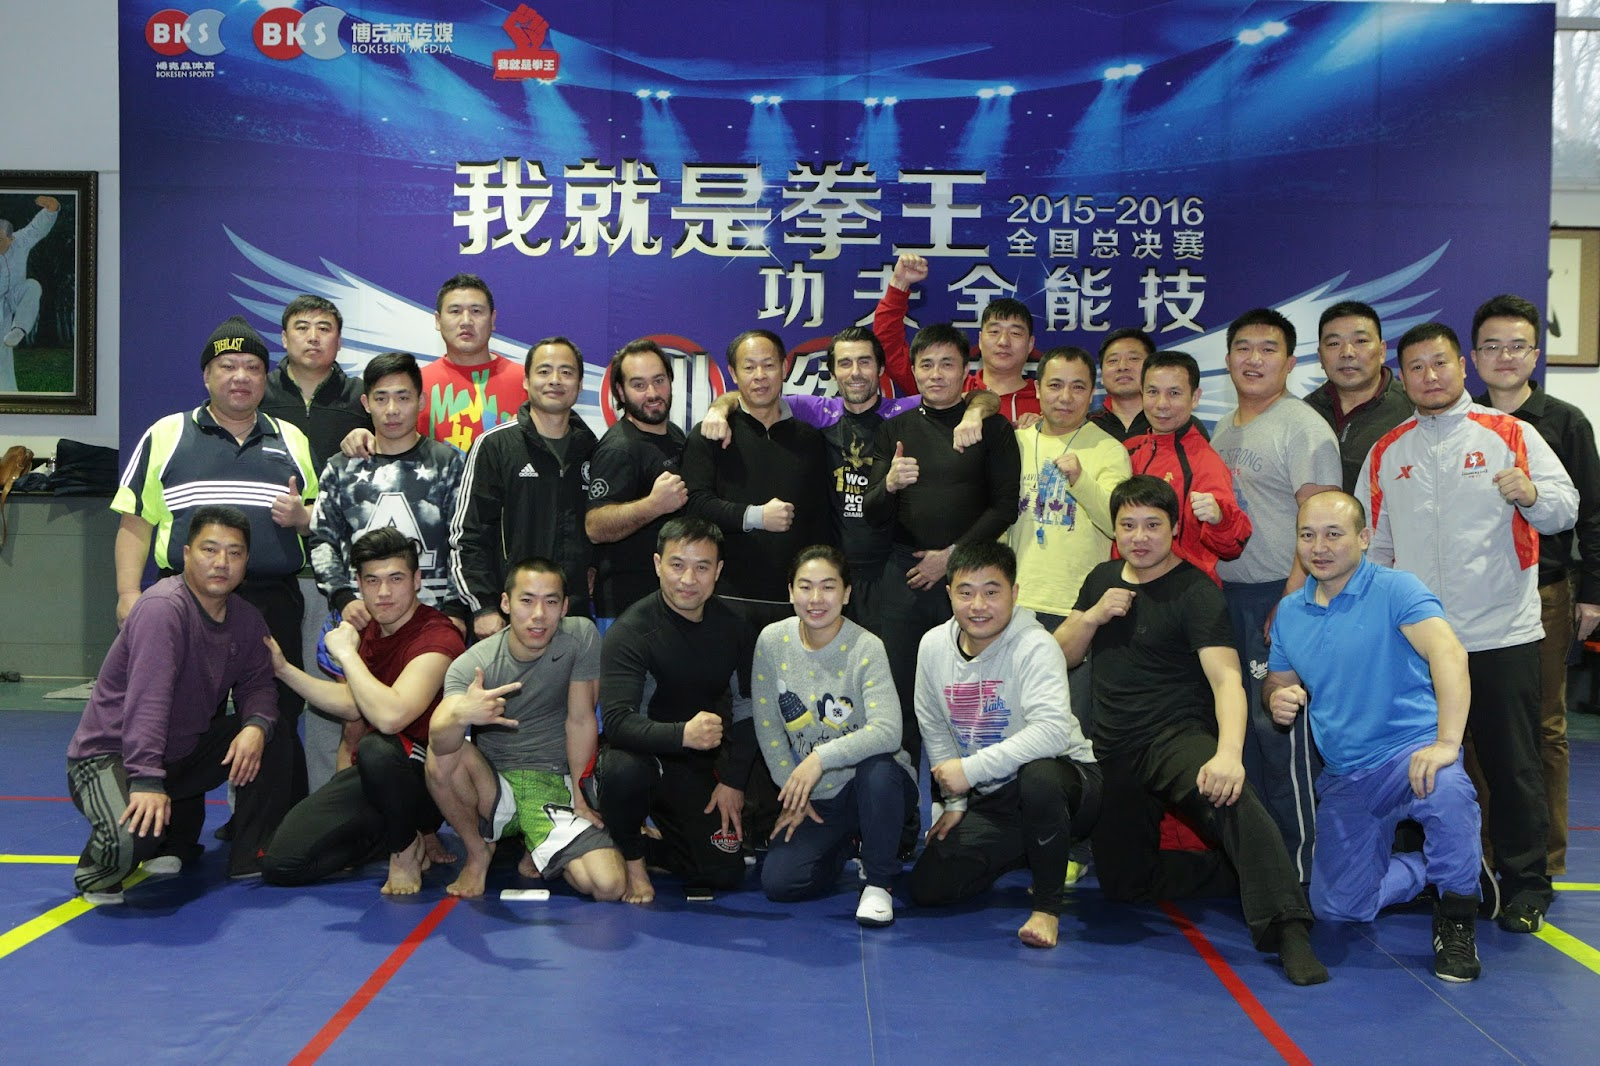 team fravid 2.JPG